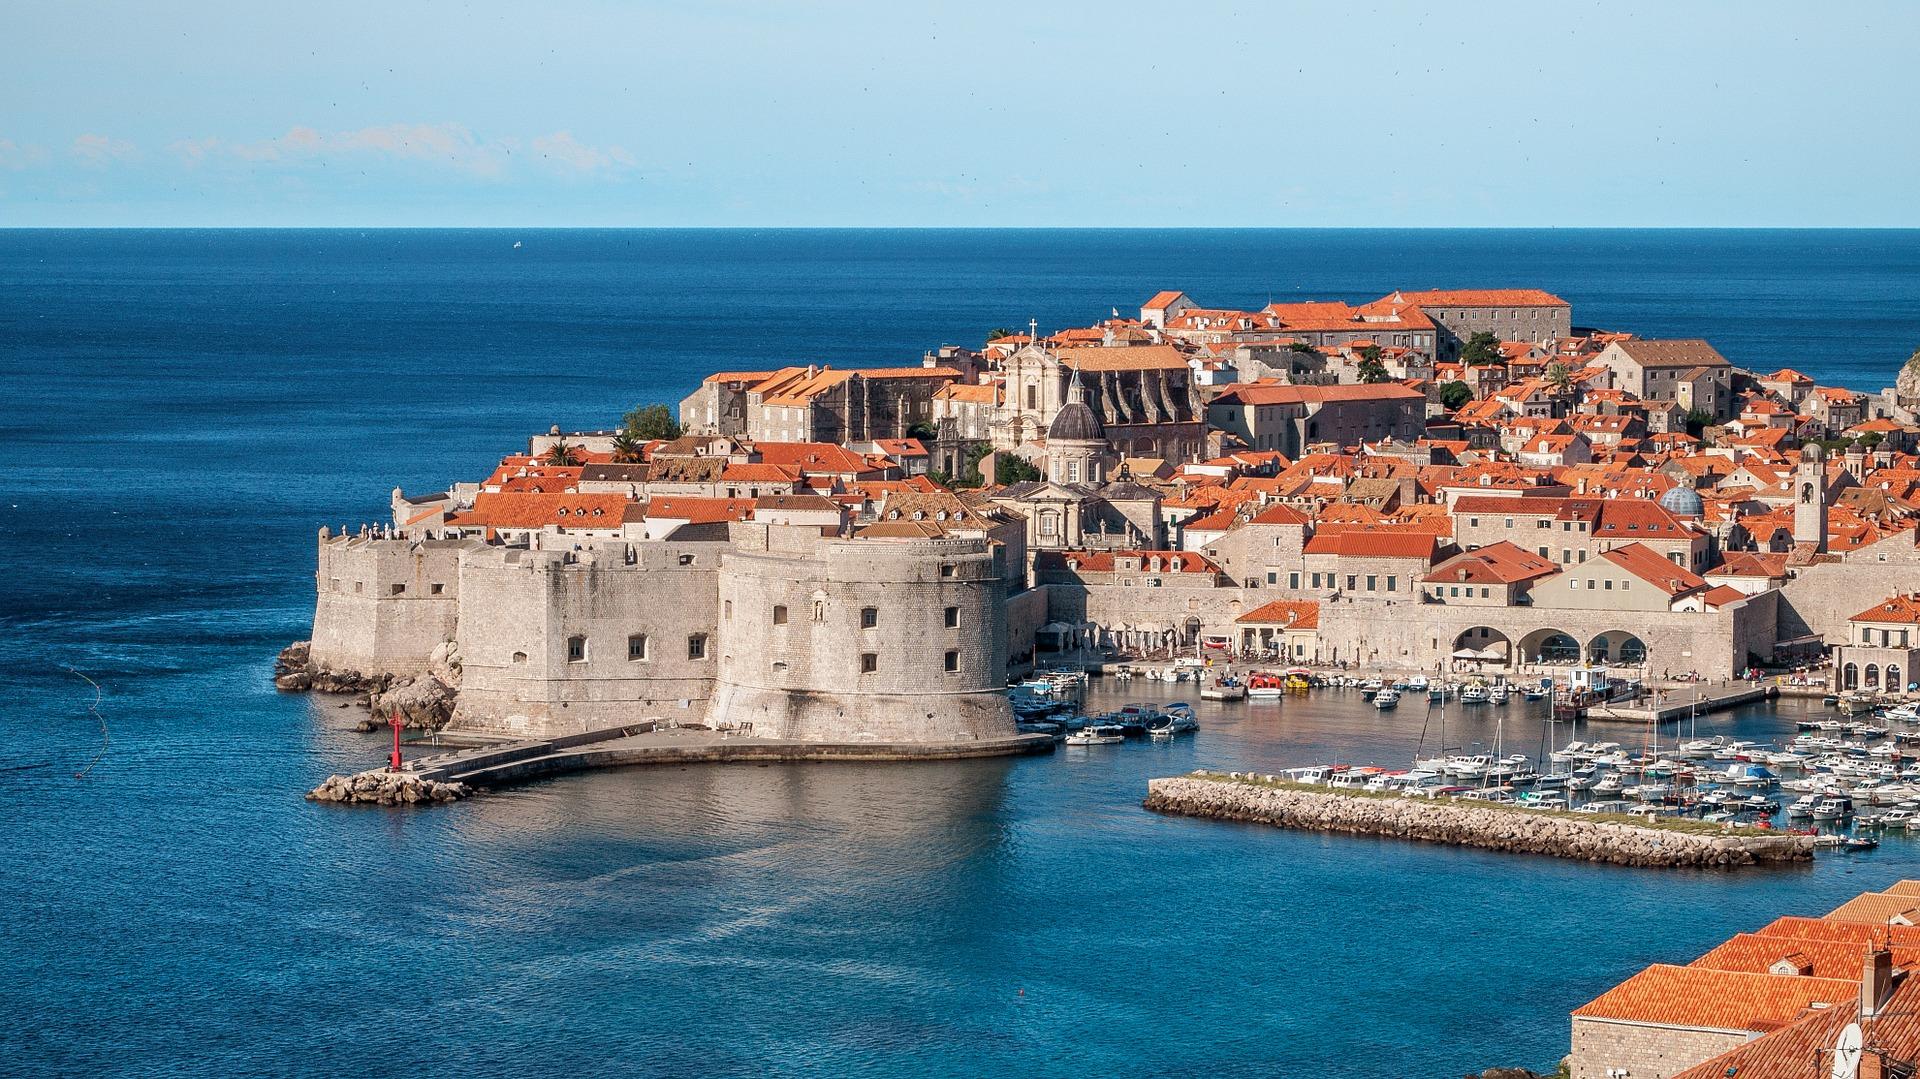 wp-content/uploads/itineraries/Croatia/croatia-dubrovnik-1.jpg